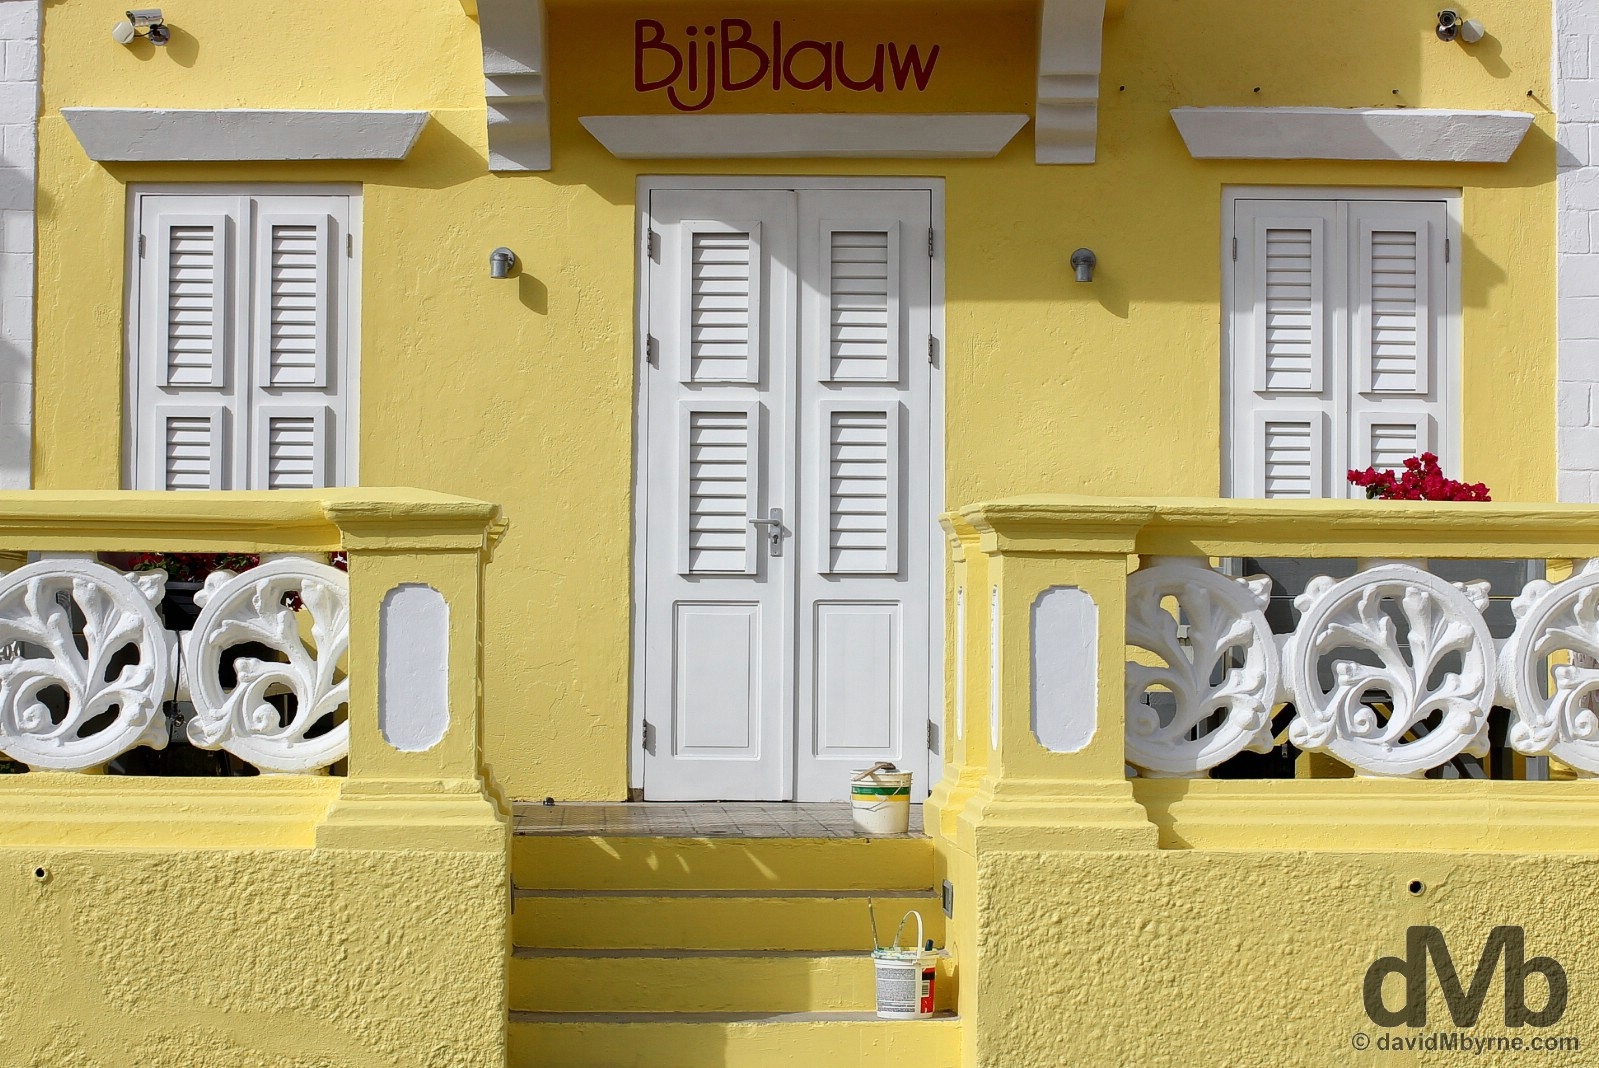 BijBlauw, Kaya Wilson Godett, Willemstad, Curacao, Lesser Antilles. June 20, 2015.